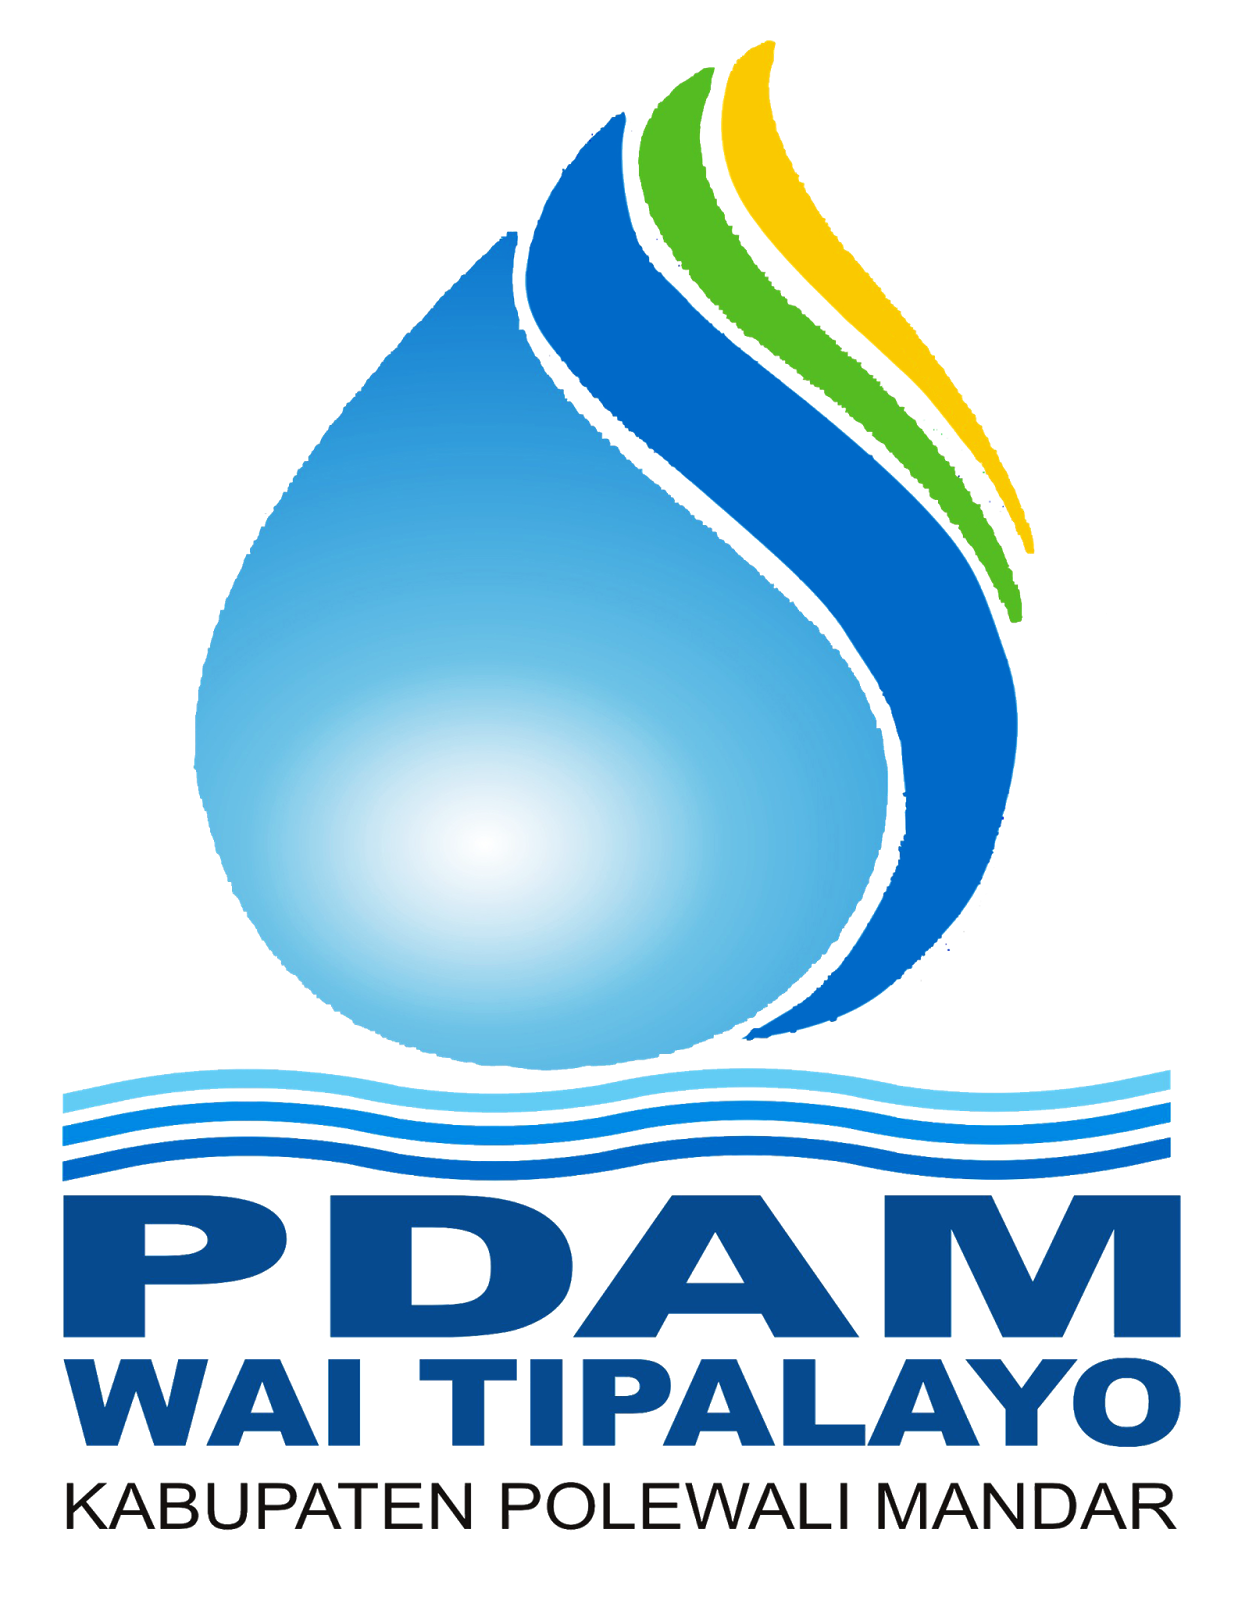 Makna dan Logo  PDAM POLMAN PDAM Polewali Mandar